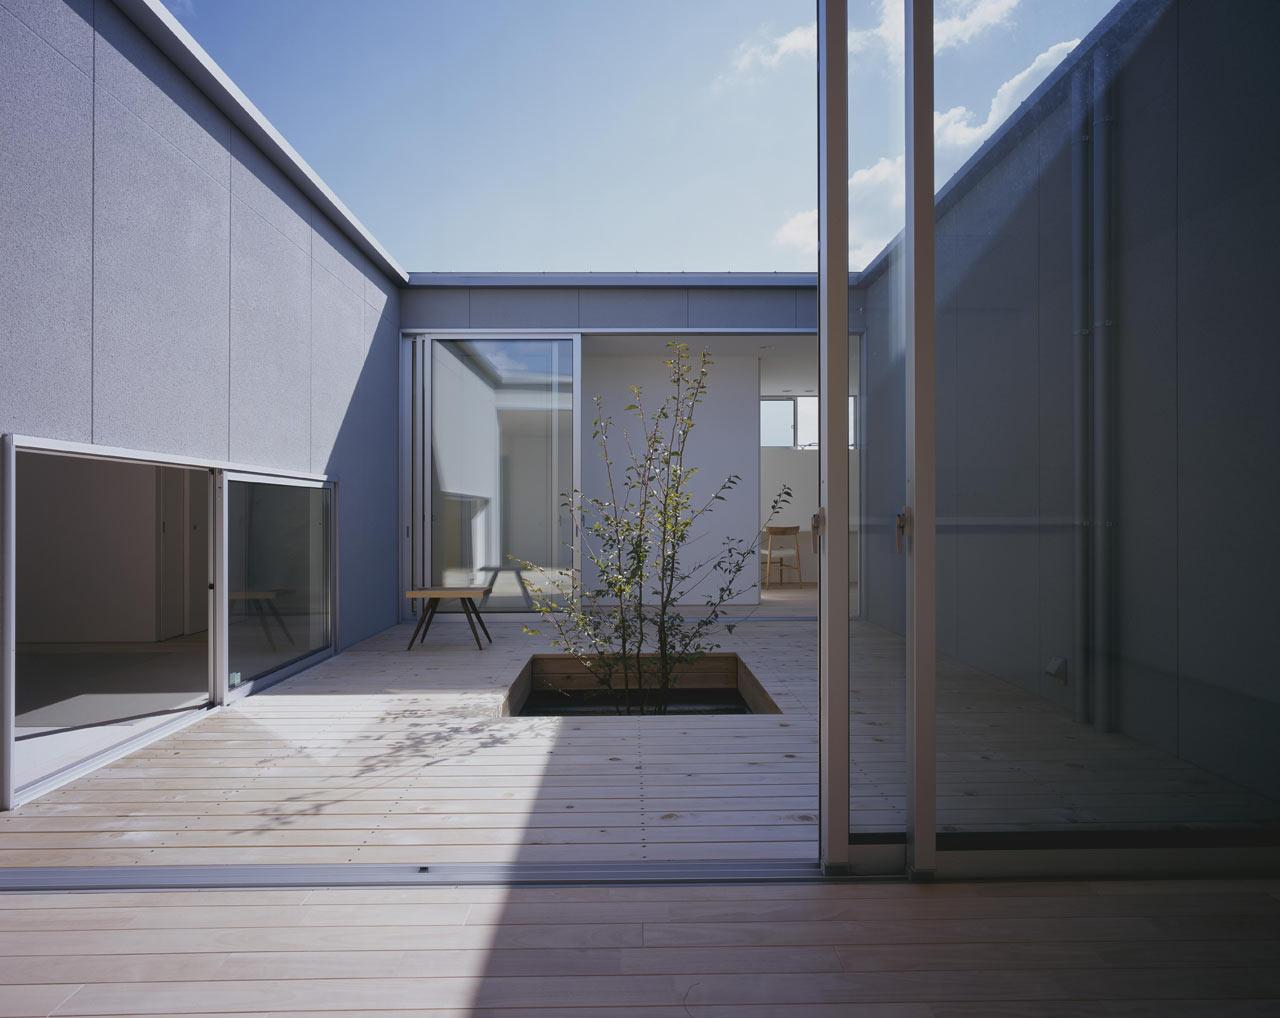 Naoko-Horibe-Naruto-House-10-courtyard